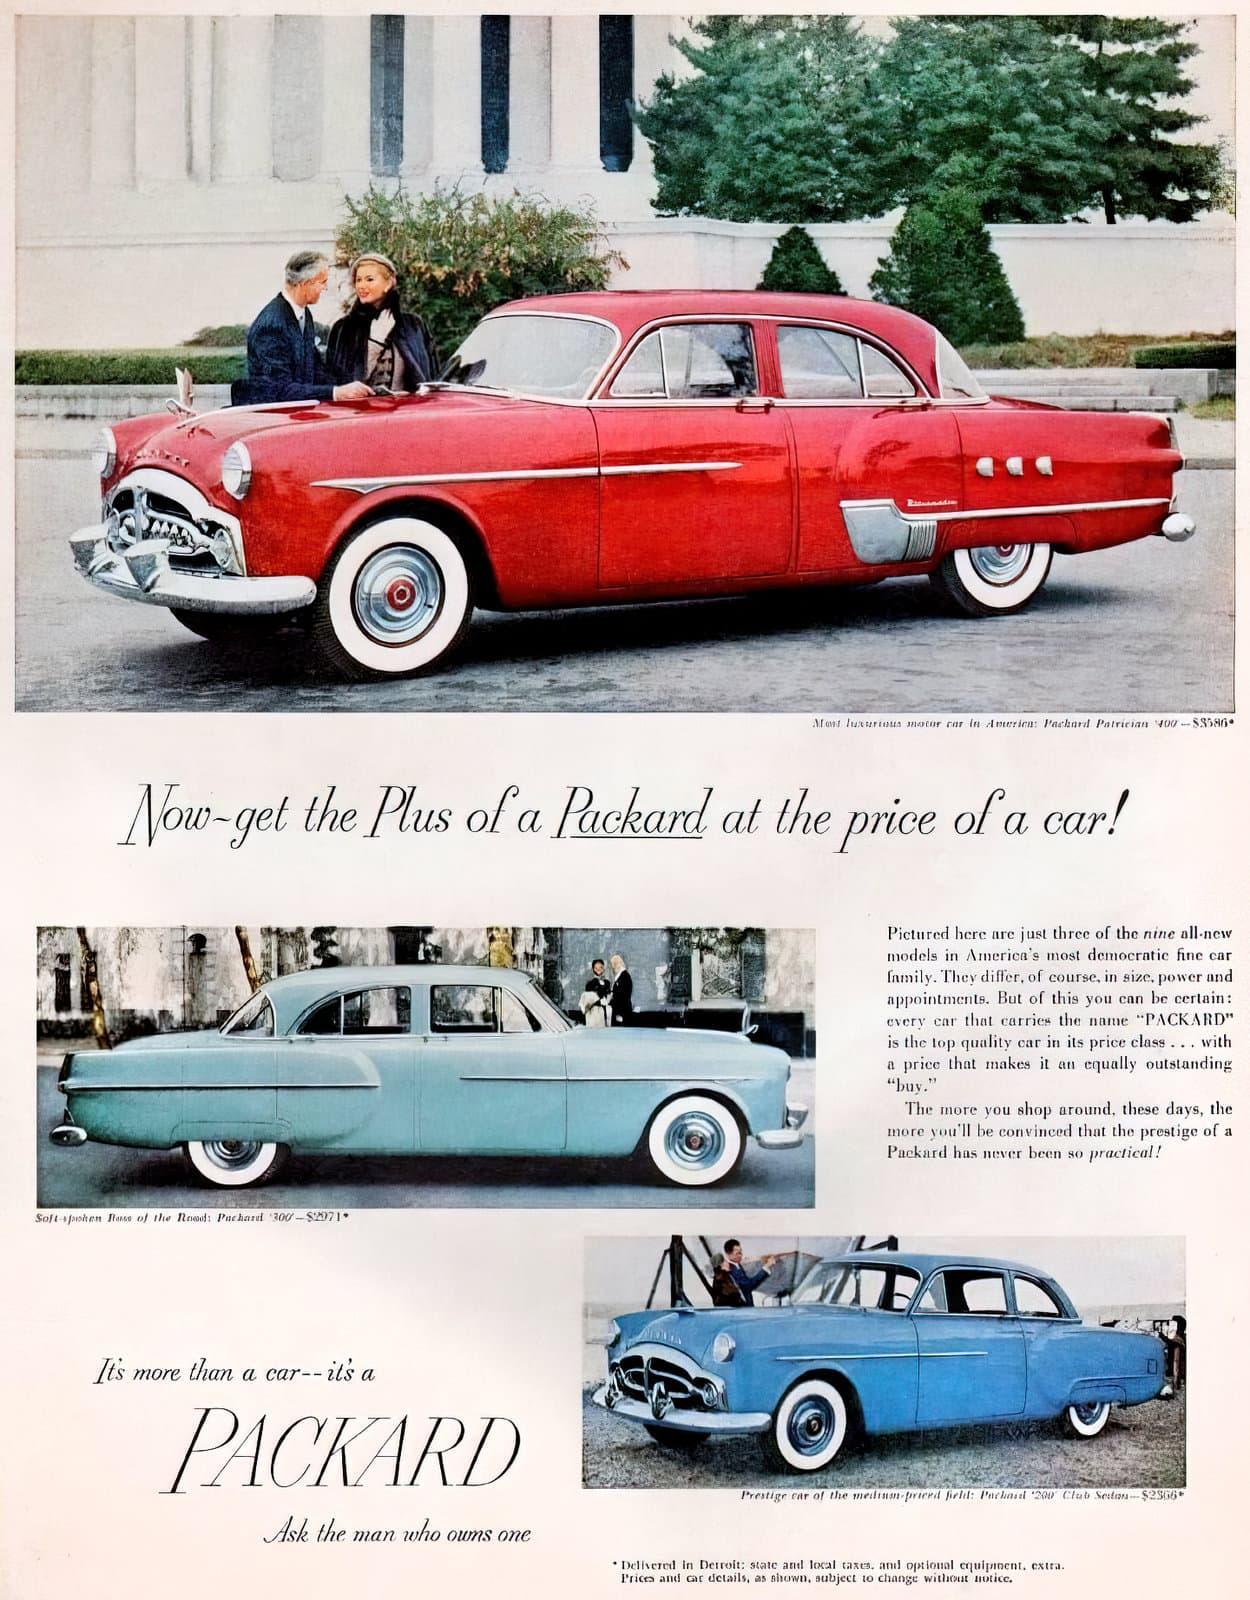 Classic Packard Patrician 400 car (1951)